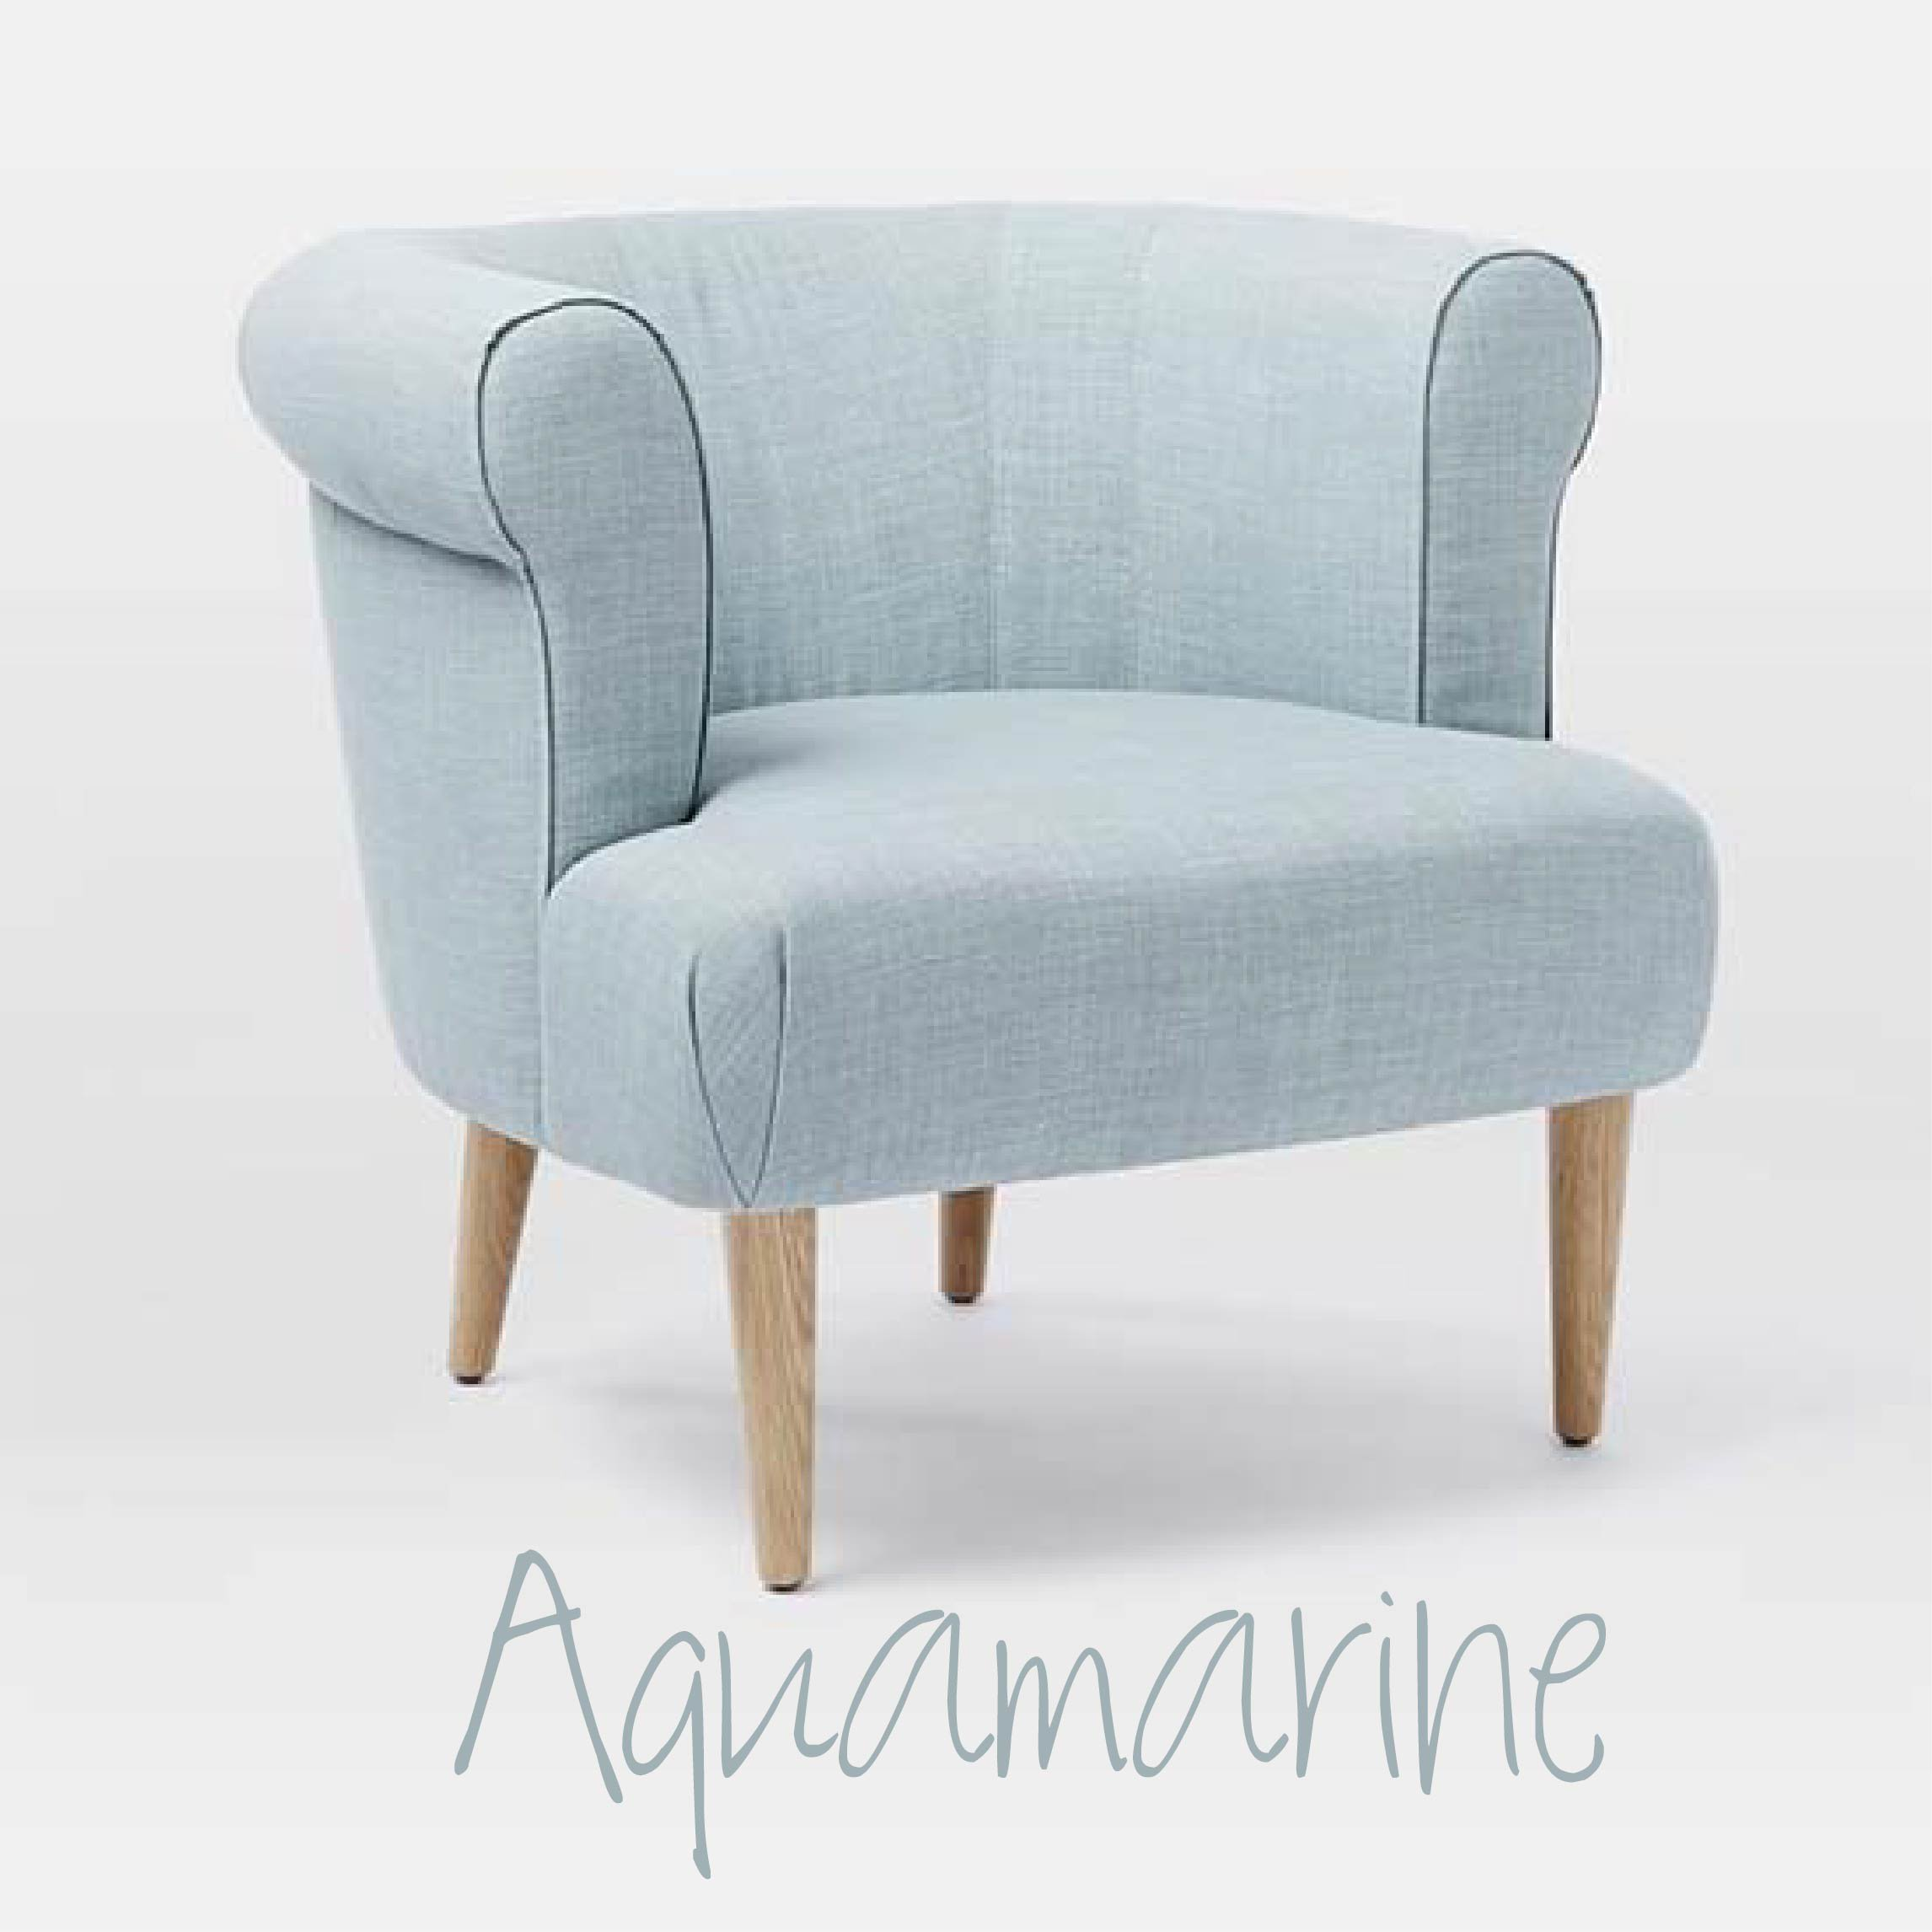 LEMONBE_Colors2015_Spring_aquamarine